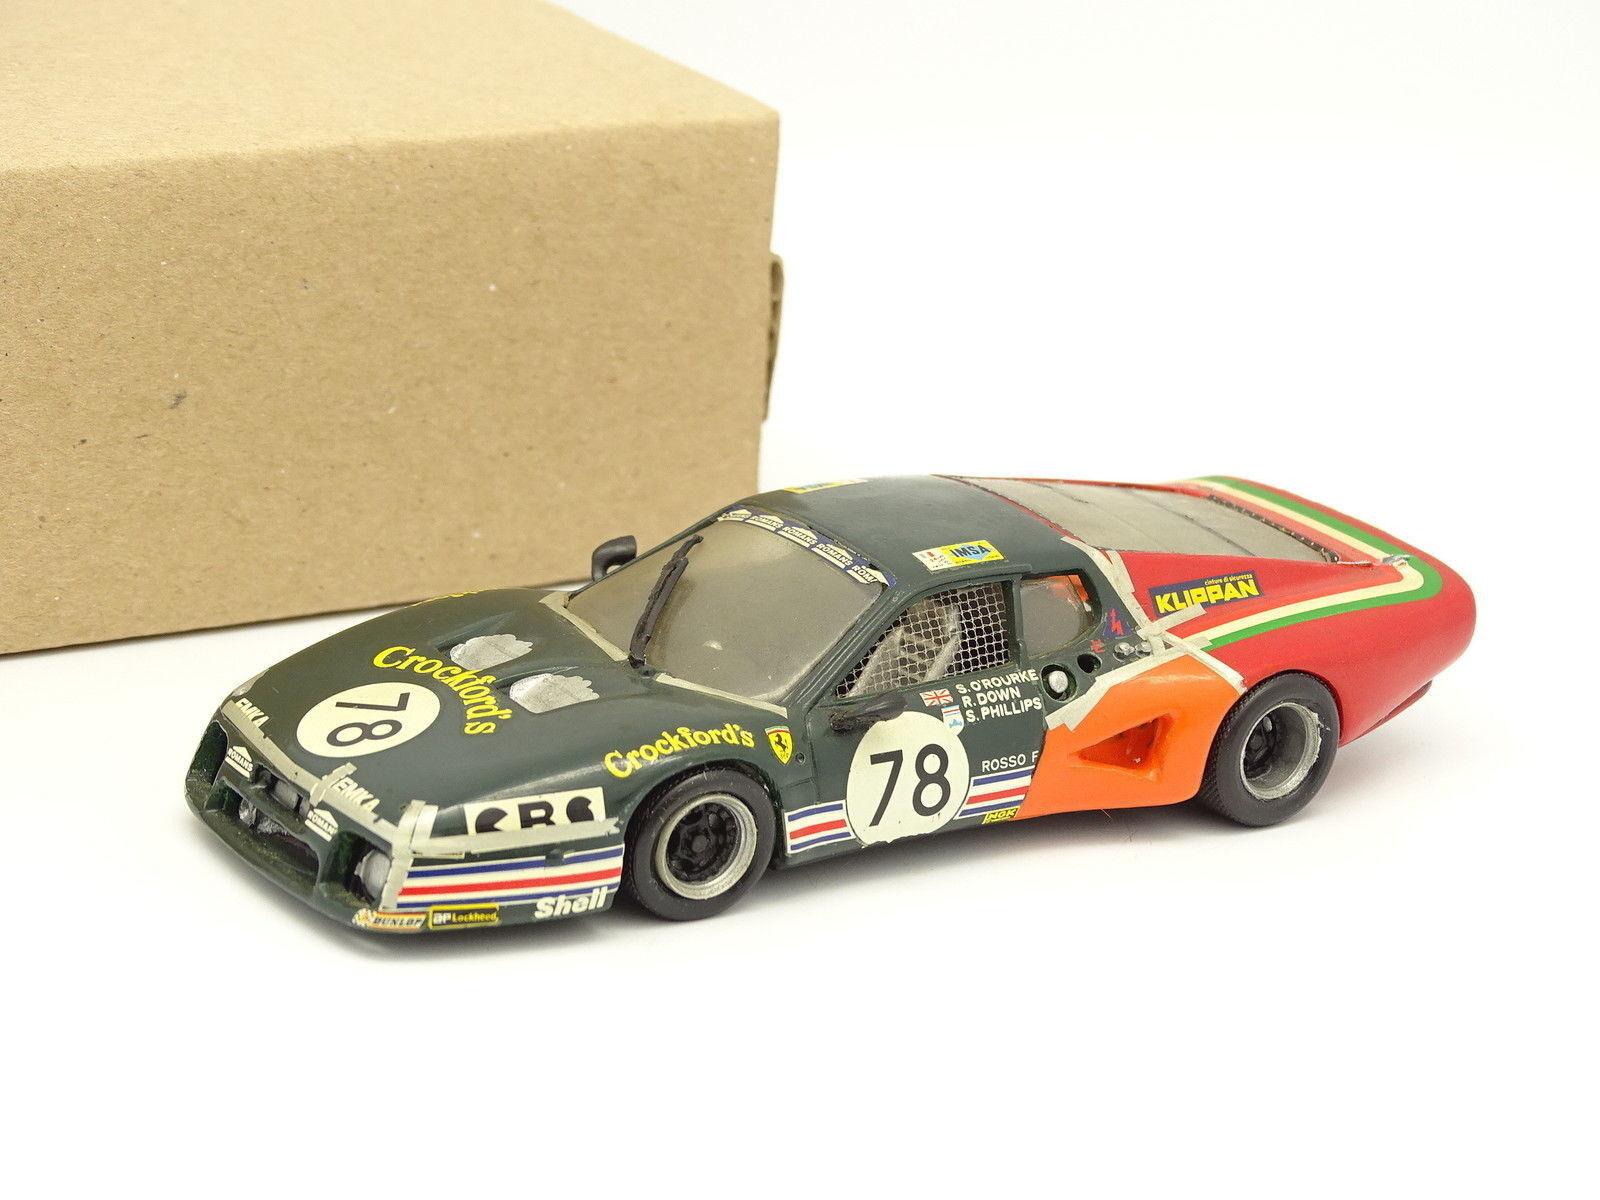 Montaje de paquetes Amr Metal 1   43 - Ferrari 512 bb Leman 1980 crockford n.78